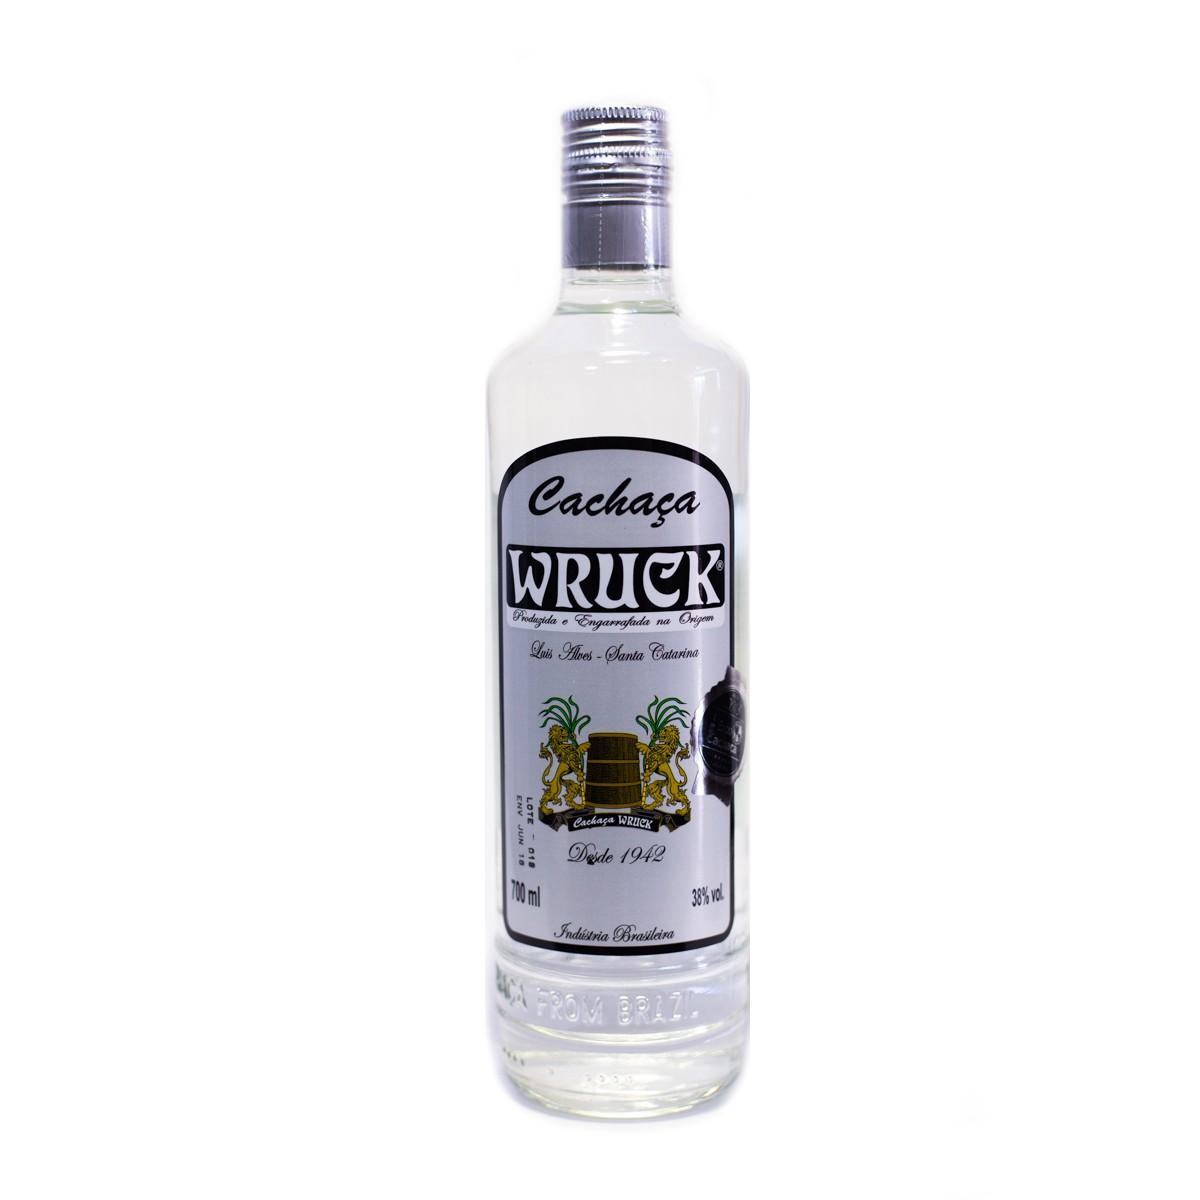 Cachaça Prata - Wruck - 700 ml